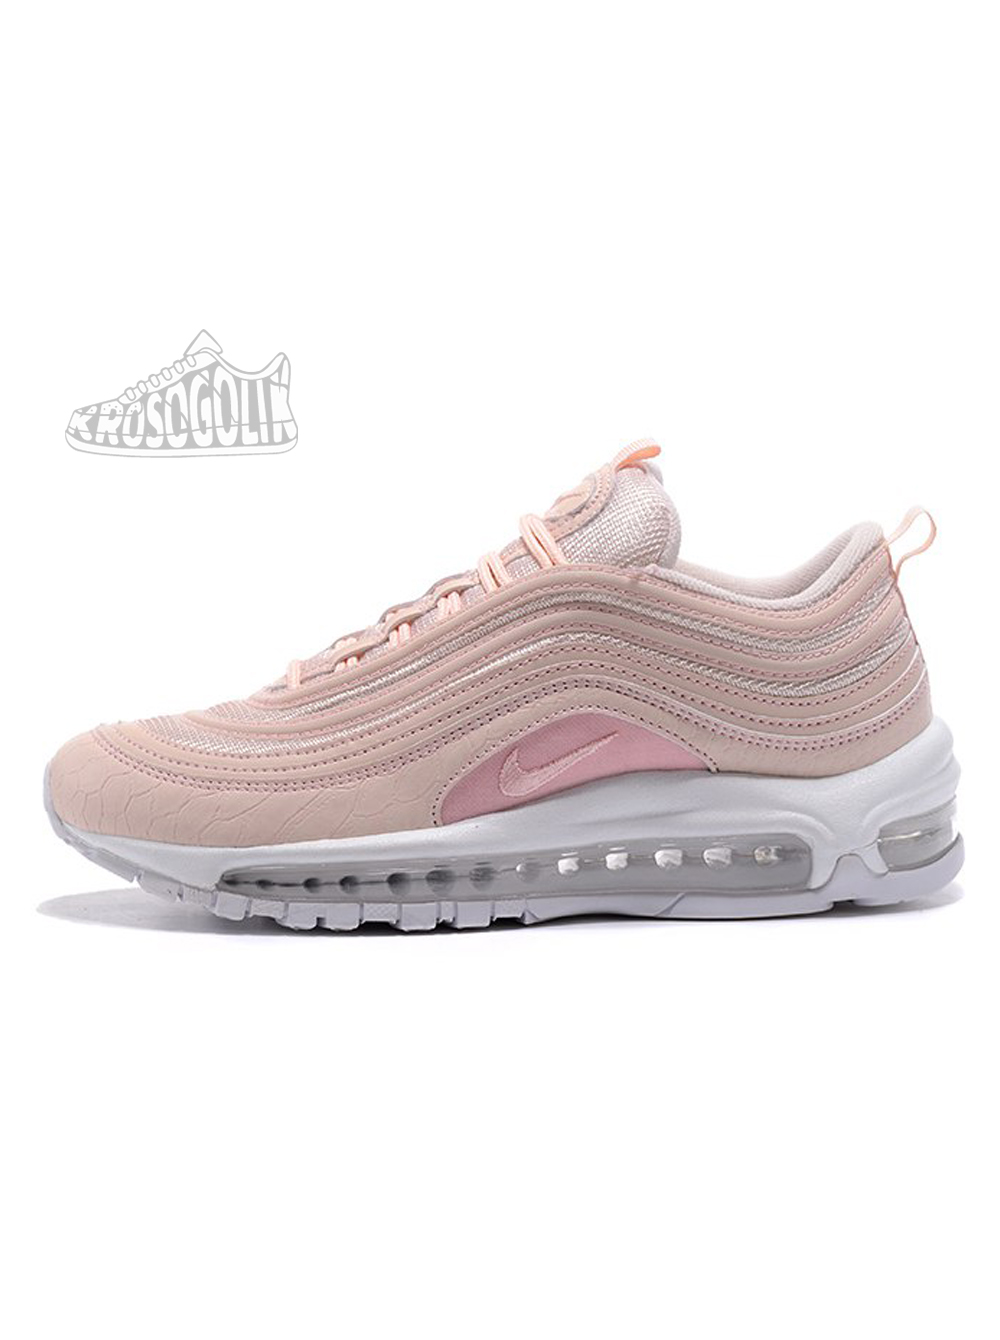 7e4048b9 Купить женские кроссовки Nike Air Max 97 Premium Pink Snakeskin на ...